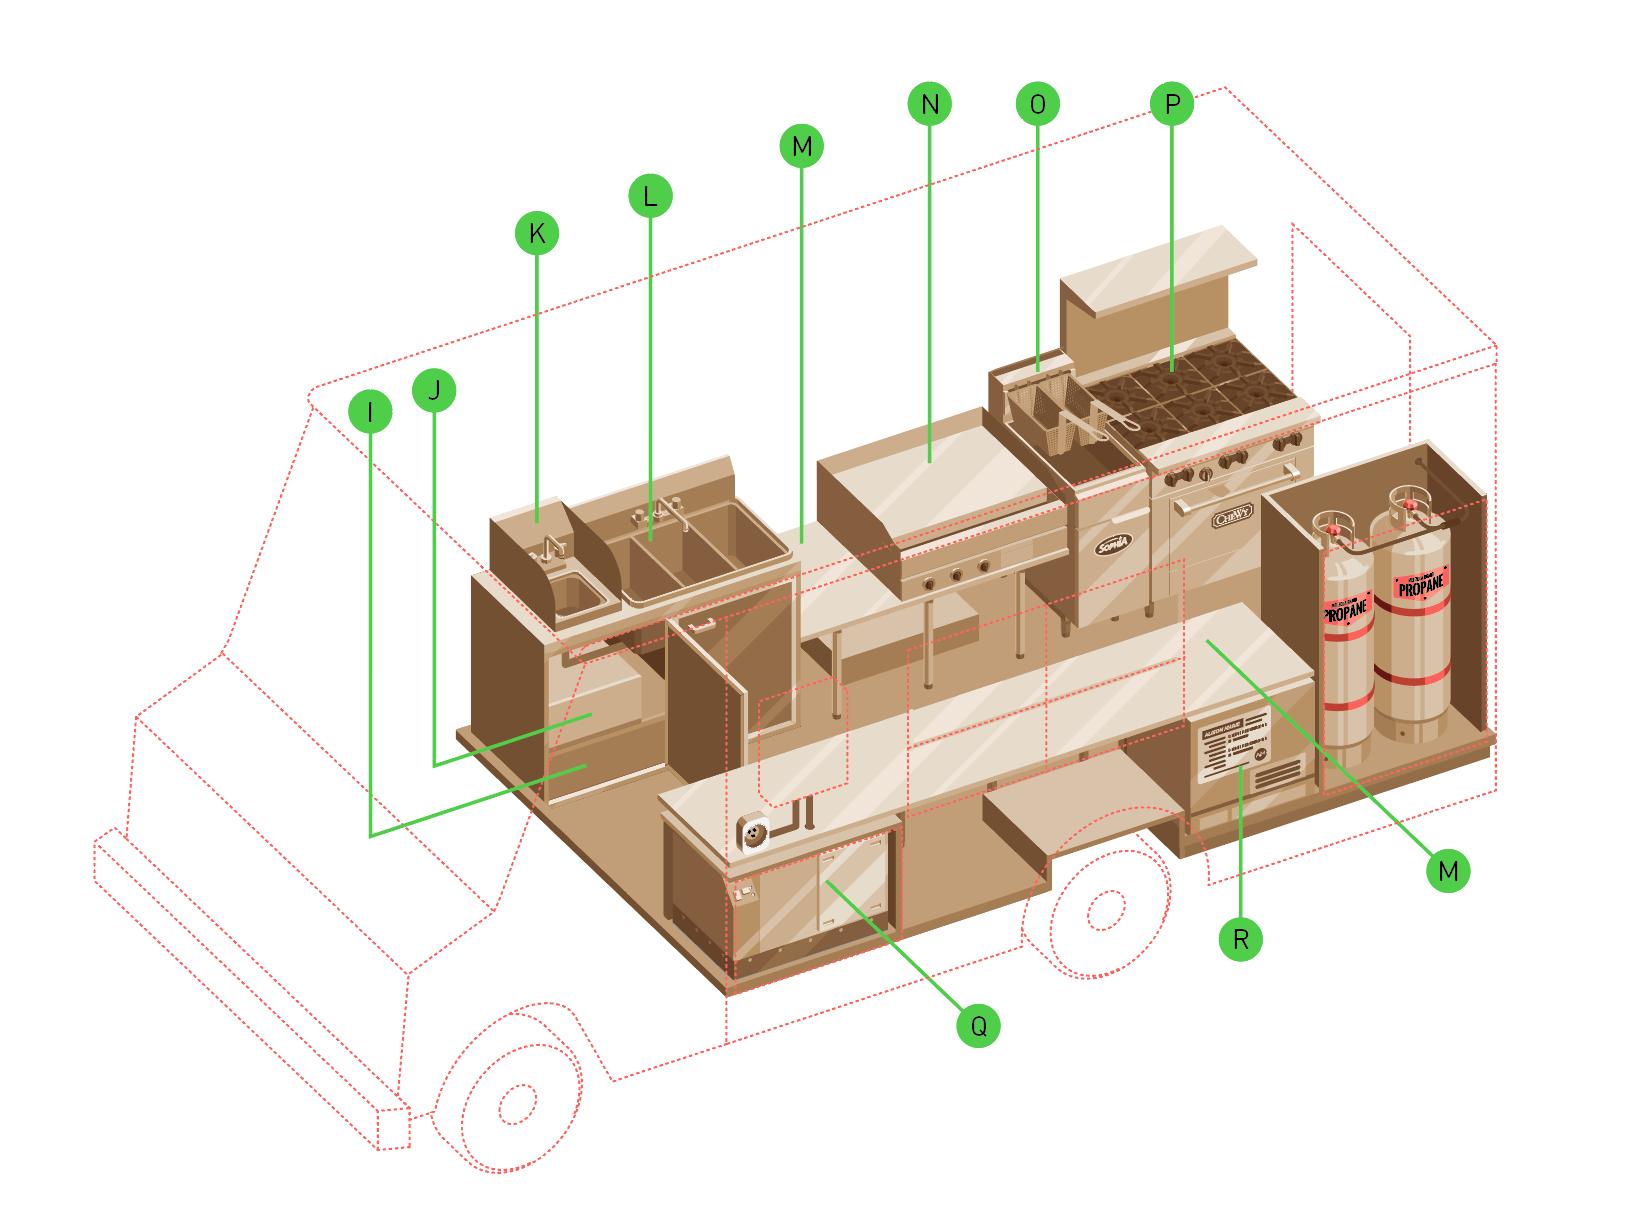 foodtruckinterior?resize\=620%2C466 grote light box wiring diagram stop light wiring diagram, grote grote lights wiring diagram at readyjetset.co